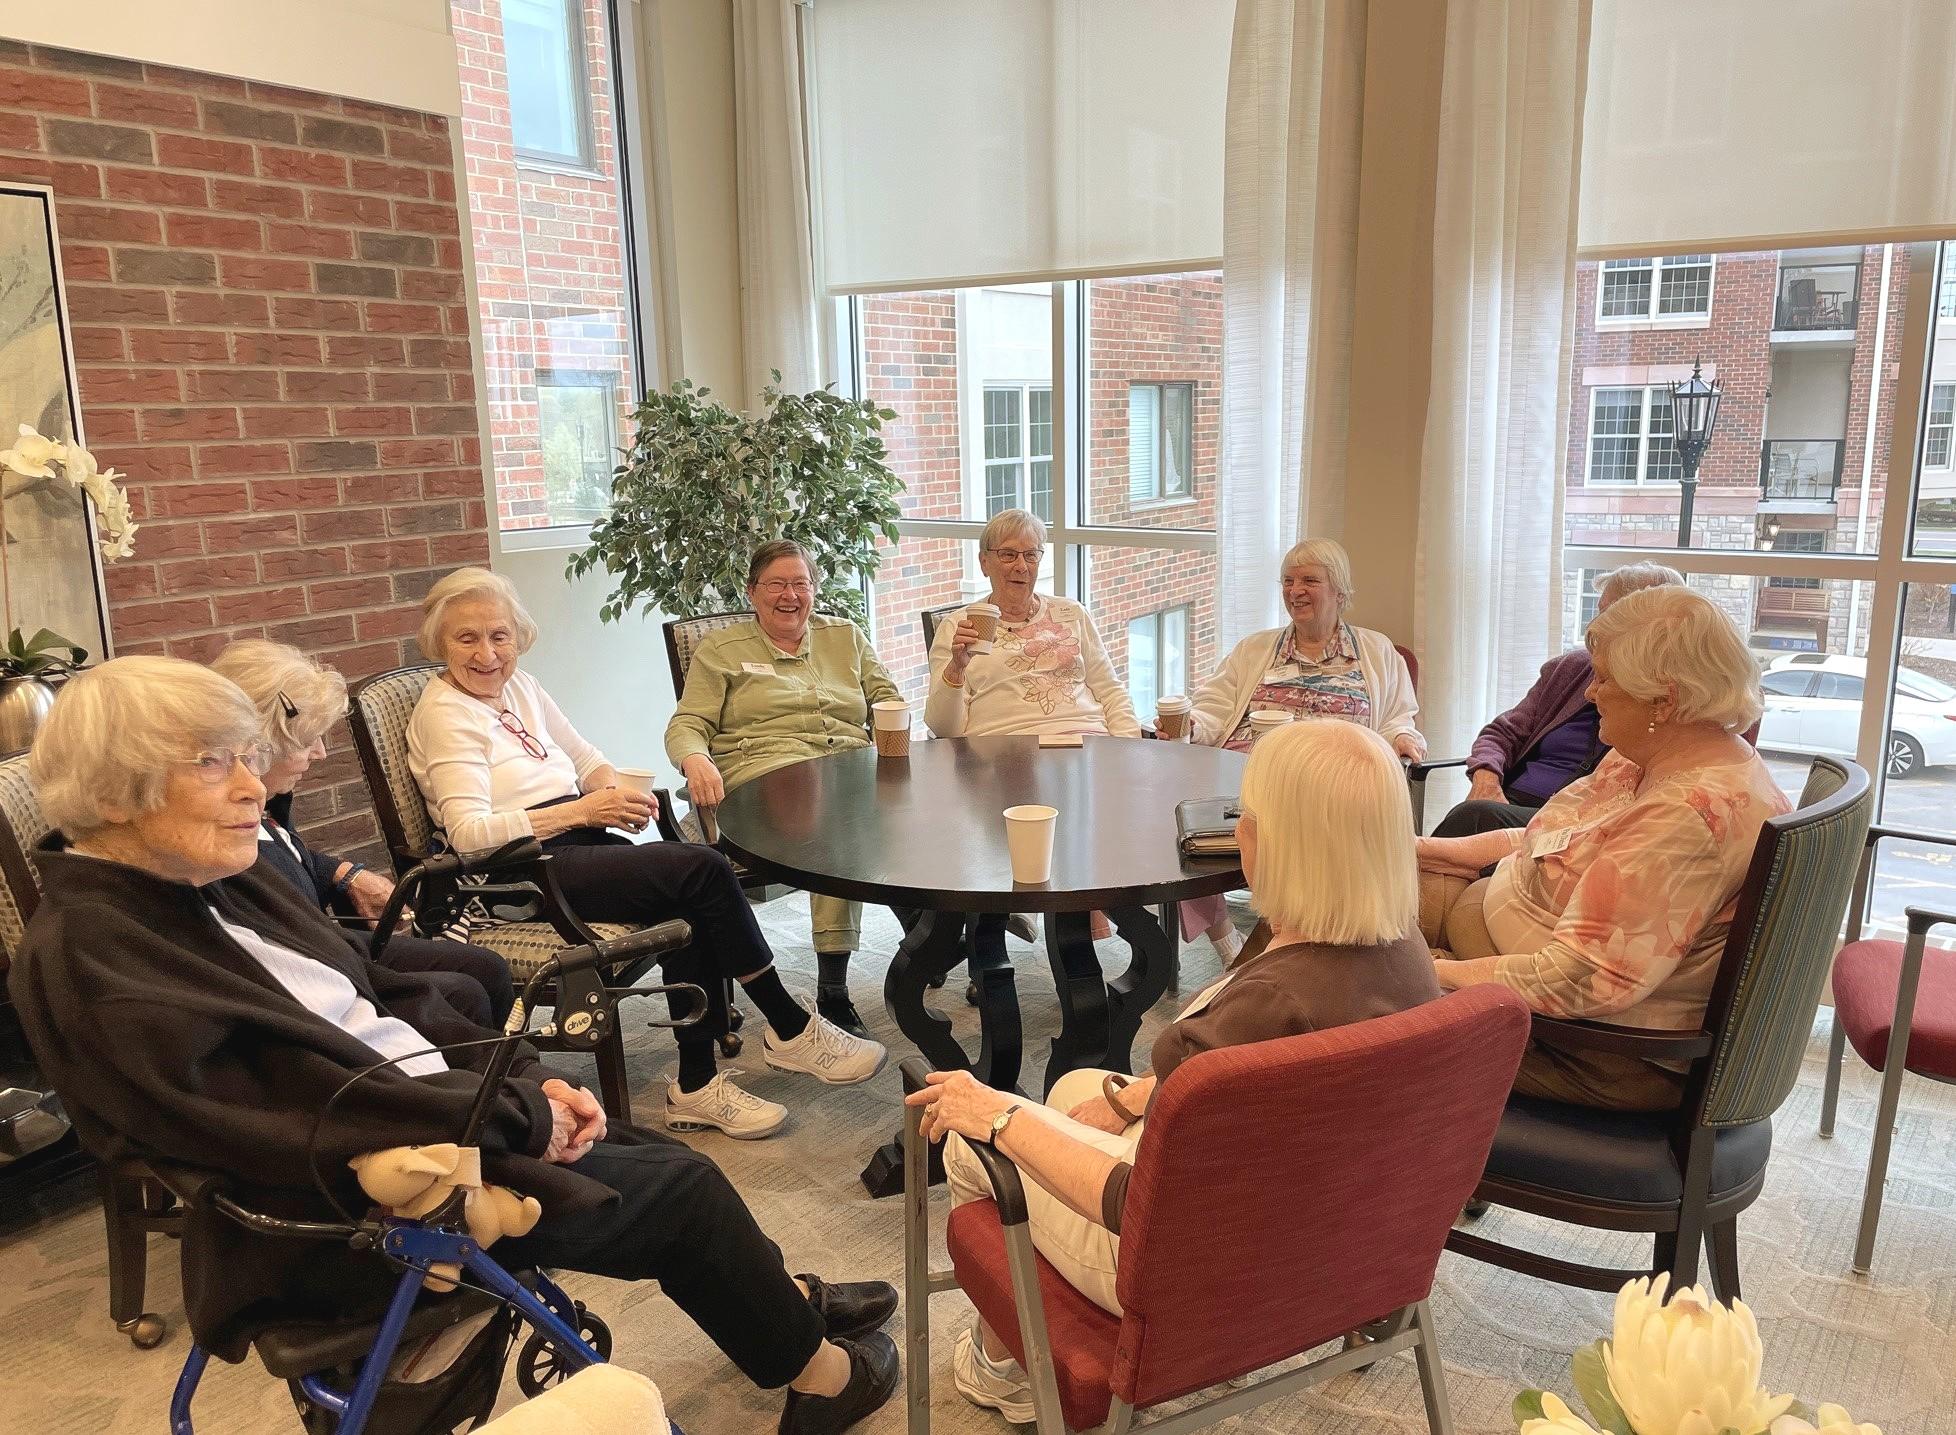 Friendship Village of Dublin residents gather for Coffee Klatch